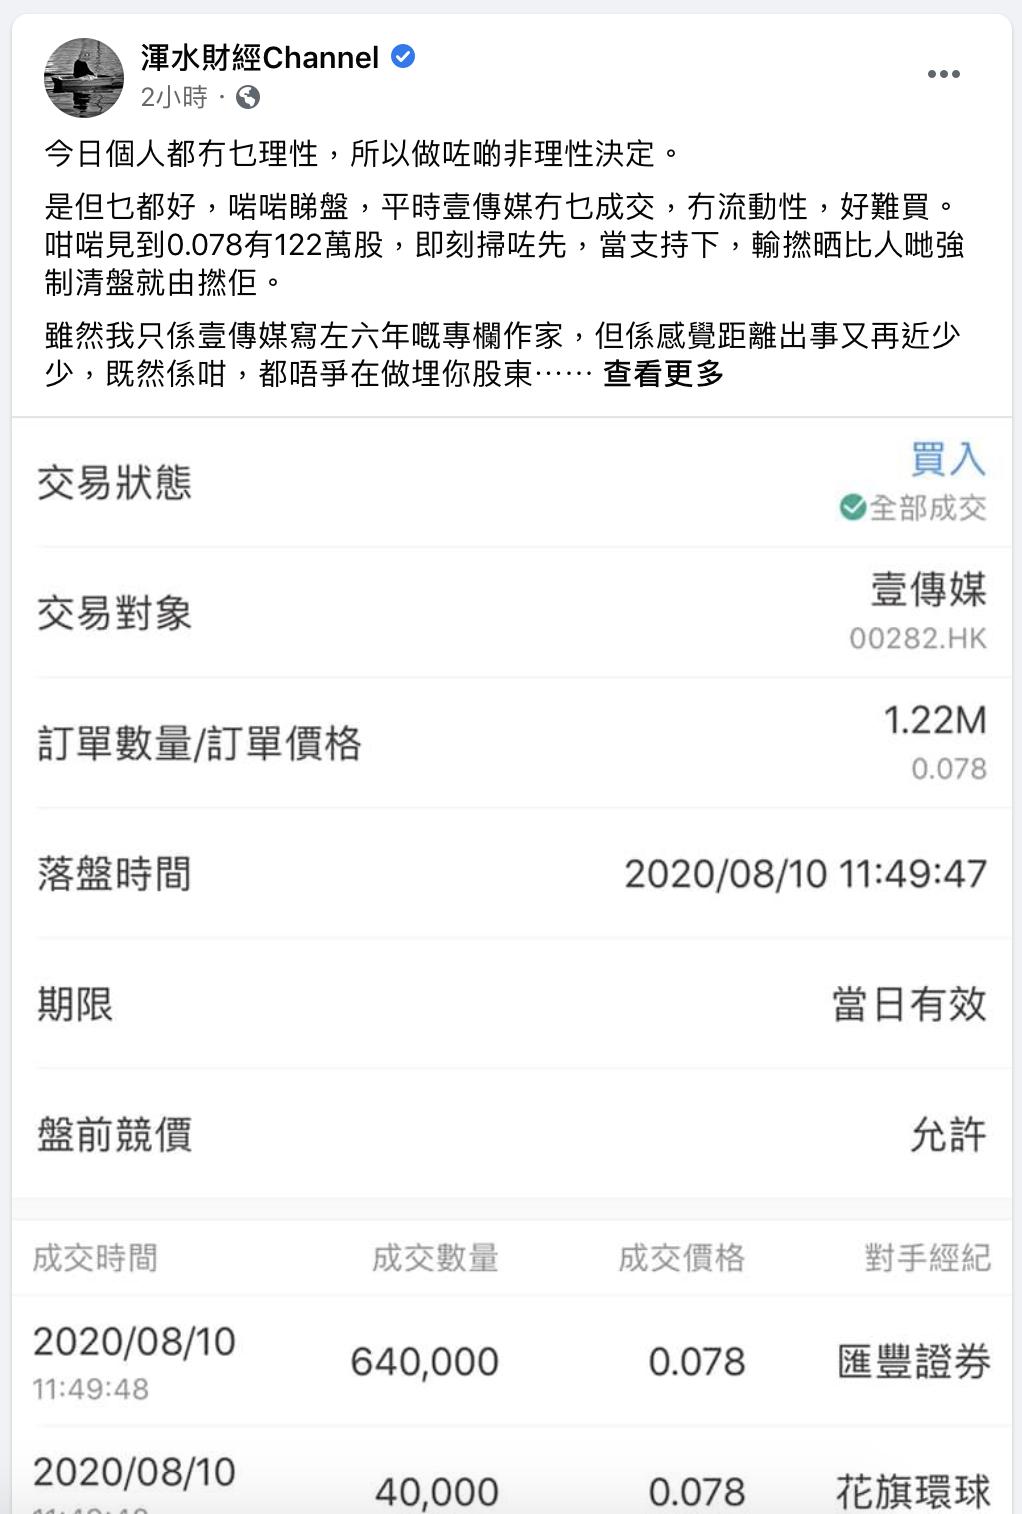 KOL渾水財經Channel亦在其Facebook頁面指其大量購入壹傳媒股票。(網絡截屏)